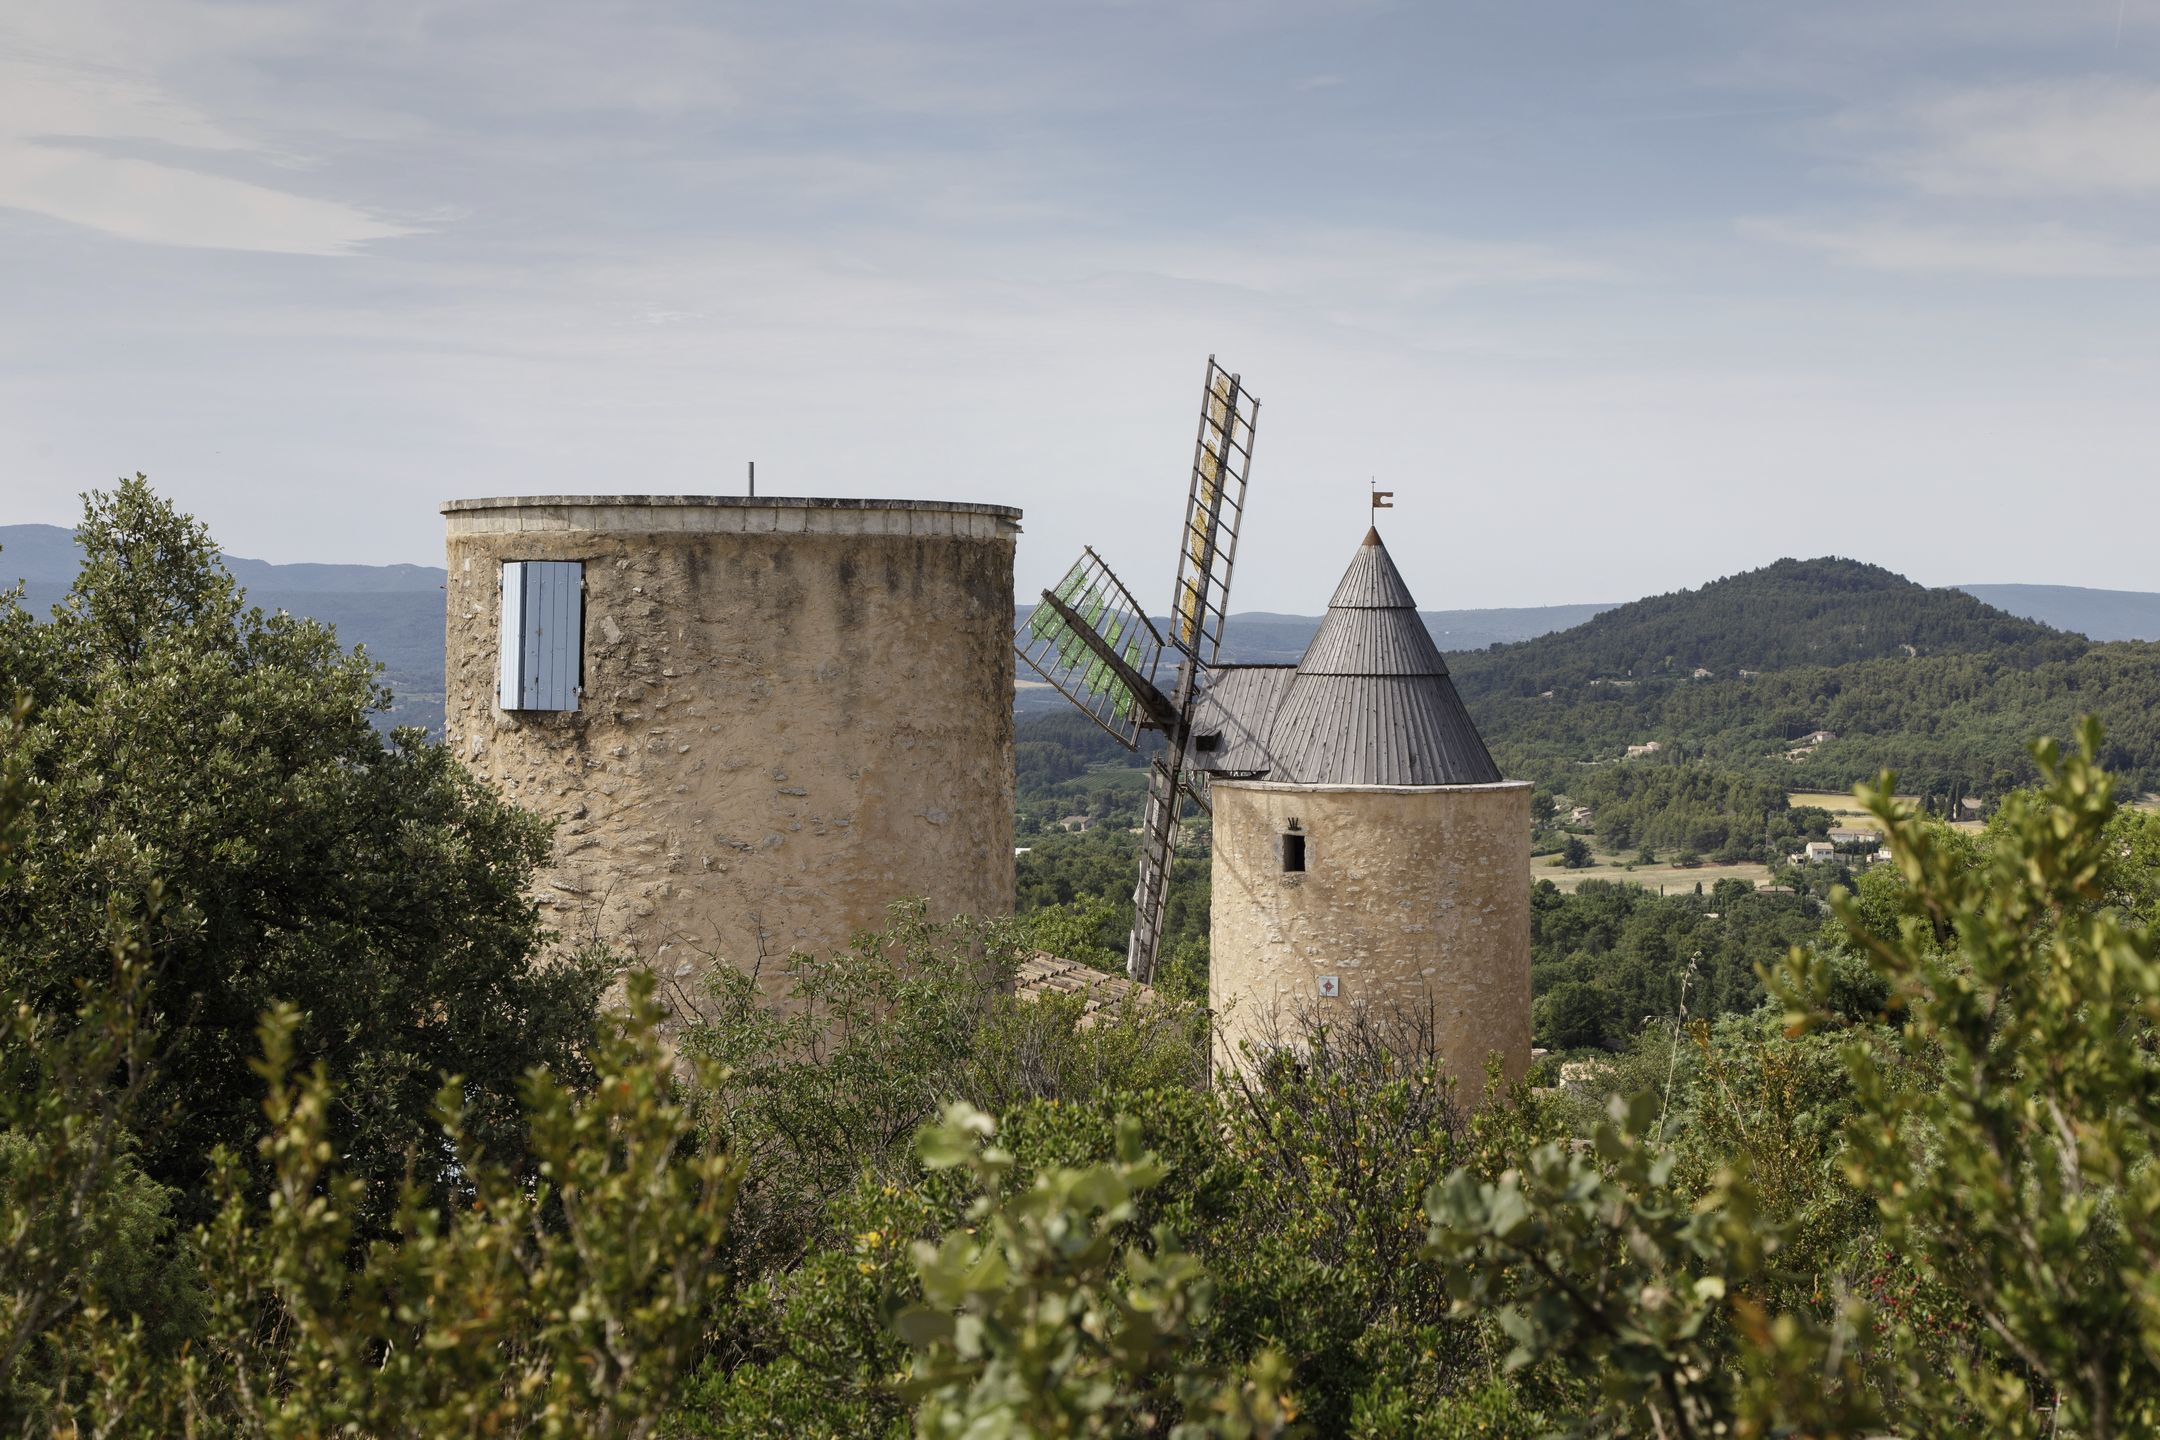 20210627-Provence-10-39-41-003